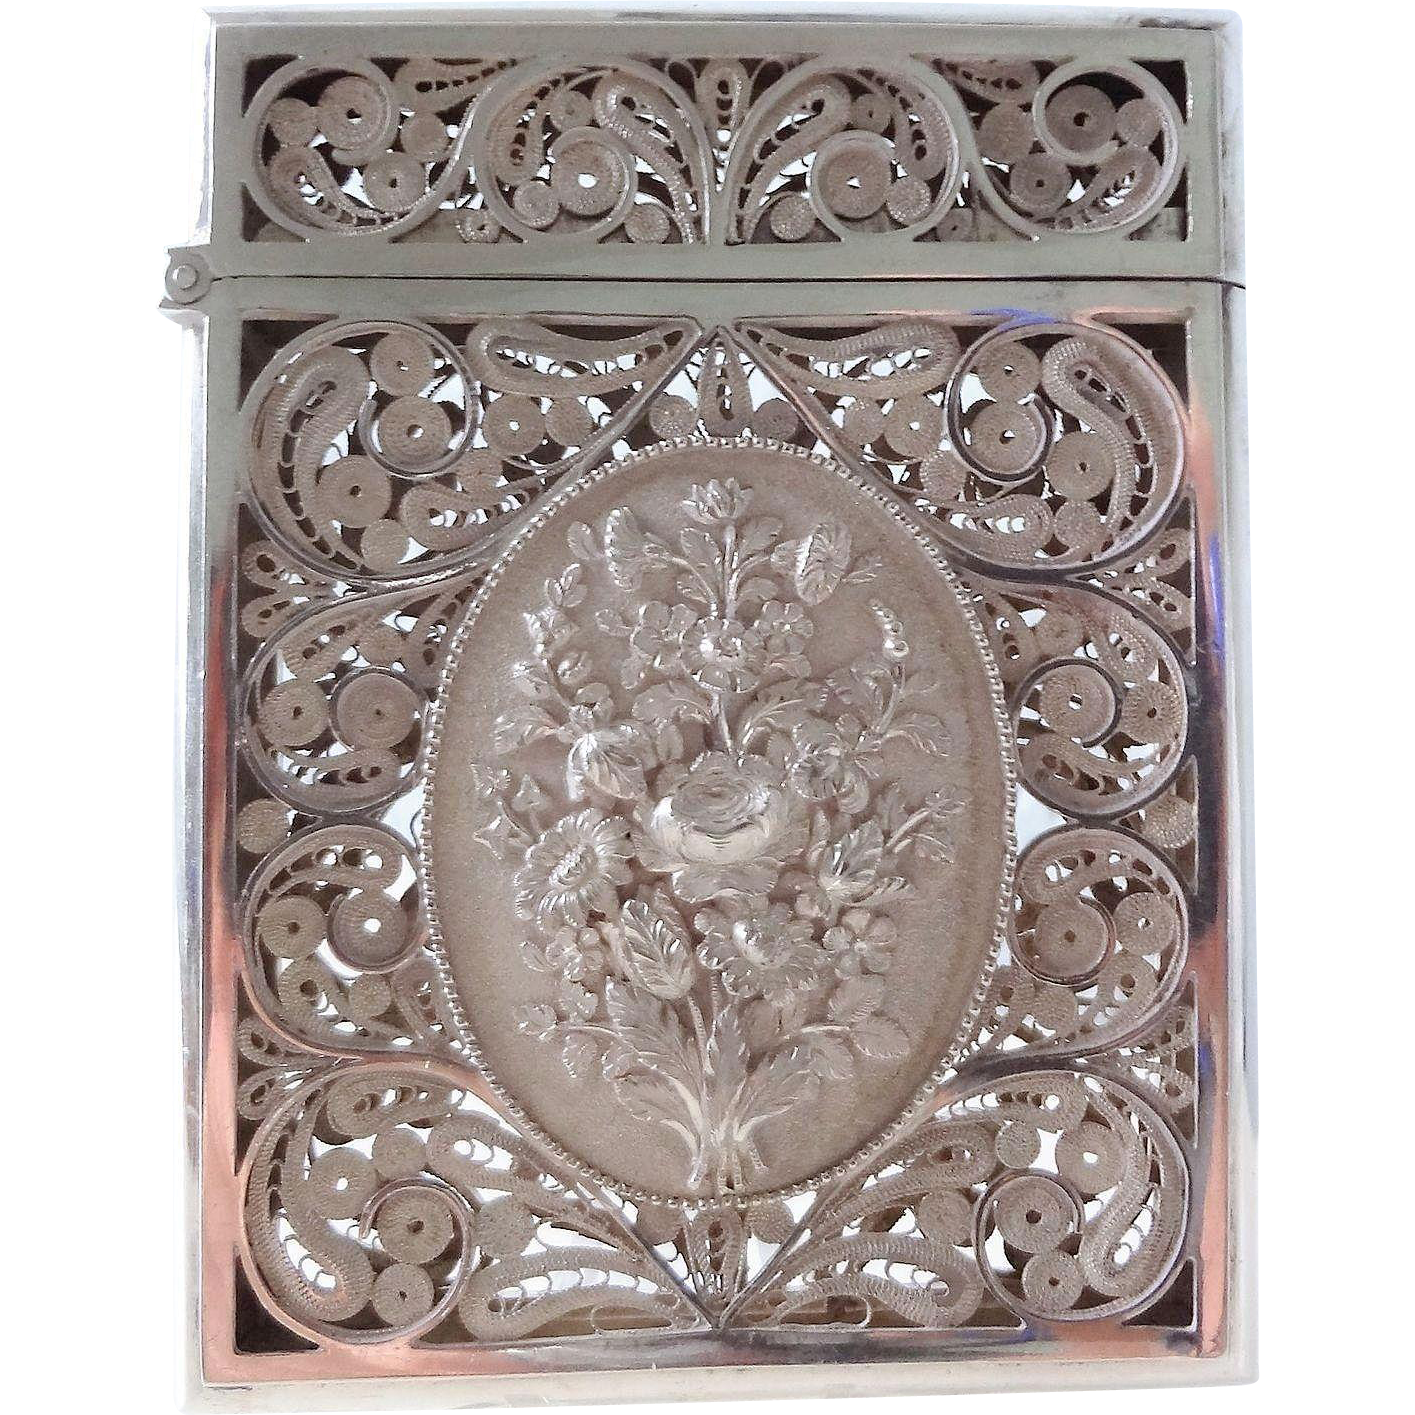 Antique Sterling Silver Filigree Calling Card Case : Fine Finds ...